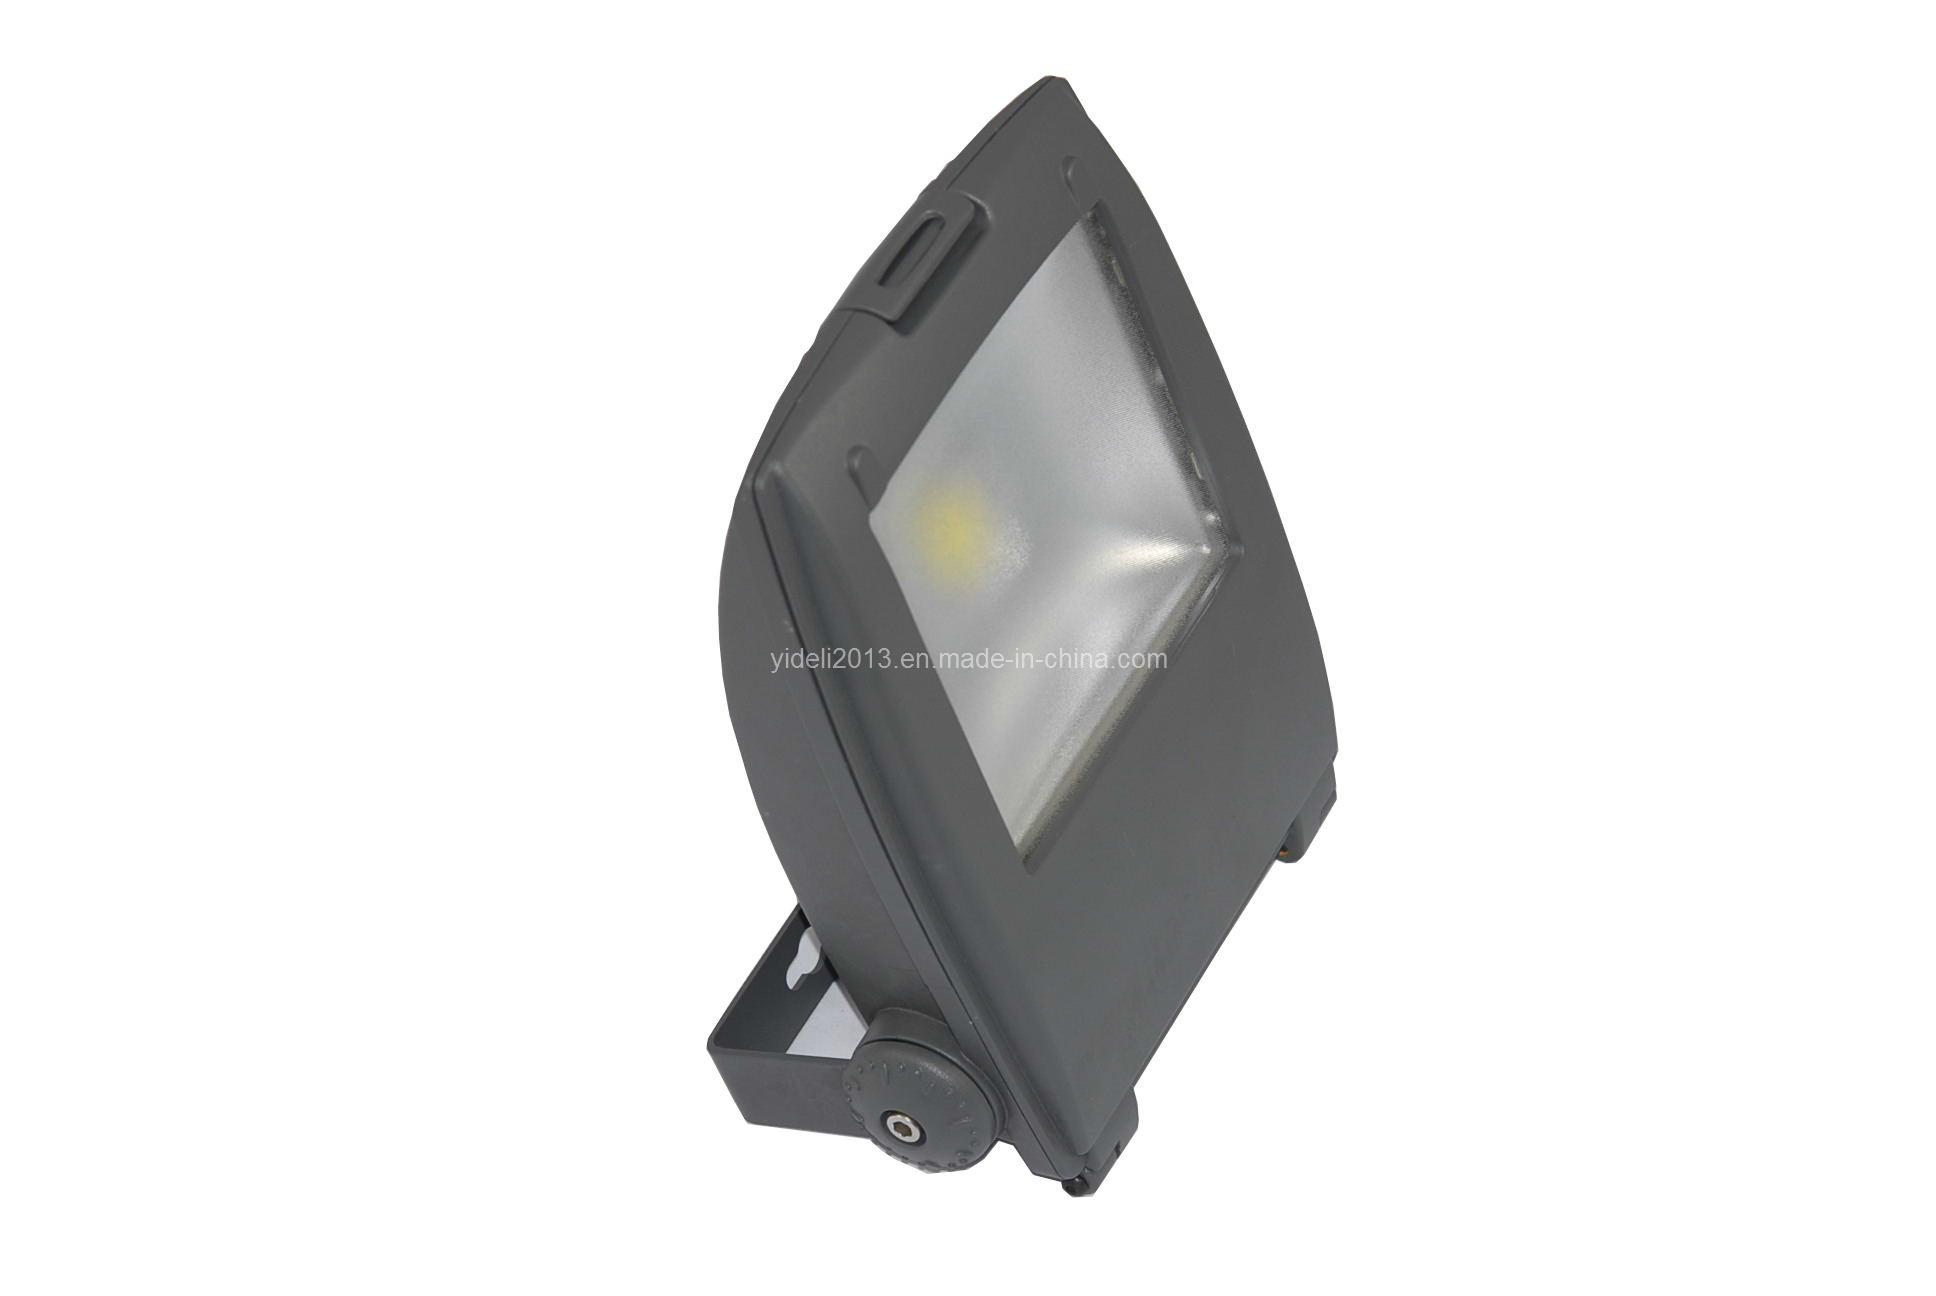 New Design SAA CE 70W IP65 High Power LED Flood Light Projector